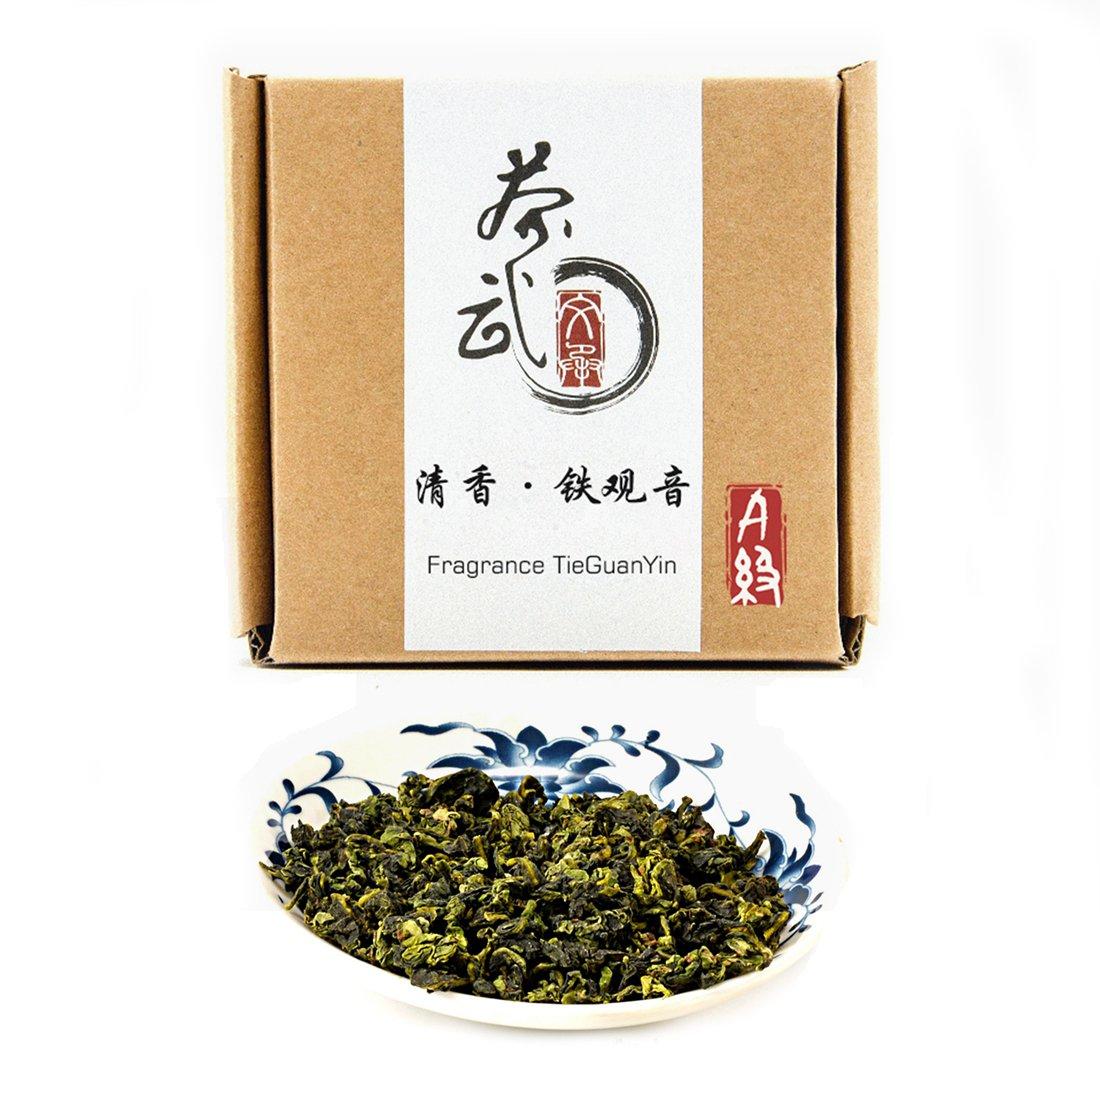 Cha Wu-[A] Fragrant TieGuanYin Oolong Tea,3.5oz/100g,New Spring Tea,Origin of AnXi,FuJian,China. (Cha Wu [A], 0.22lb/100g)